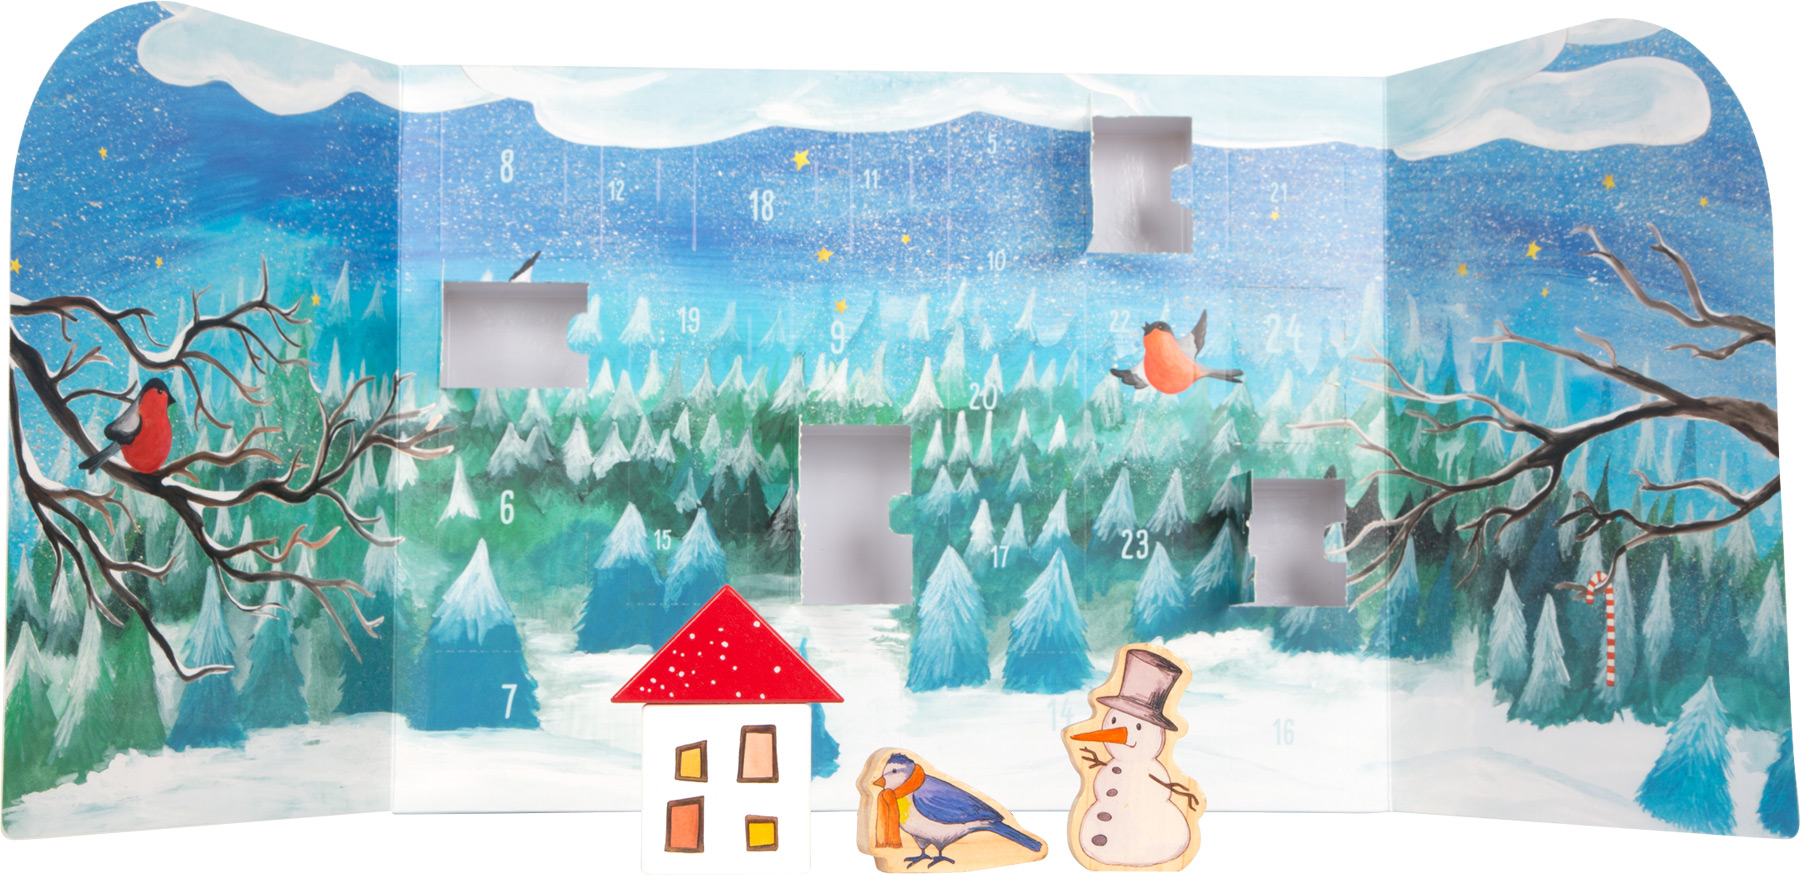 Coup de coeur Legler Noel 2020 - Calendrier de l'avant Forêt d'hiver